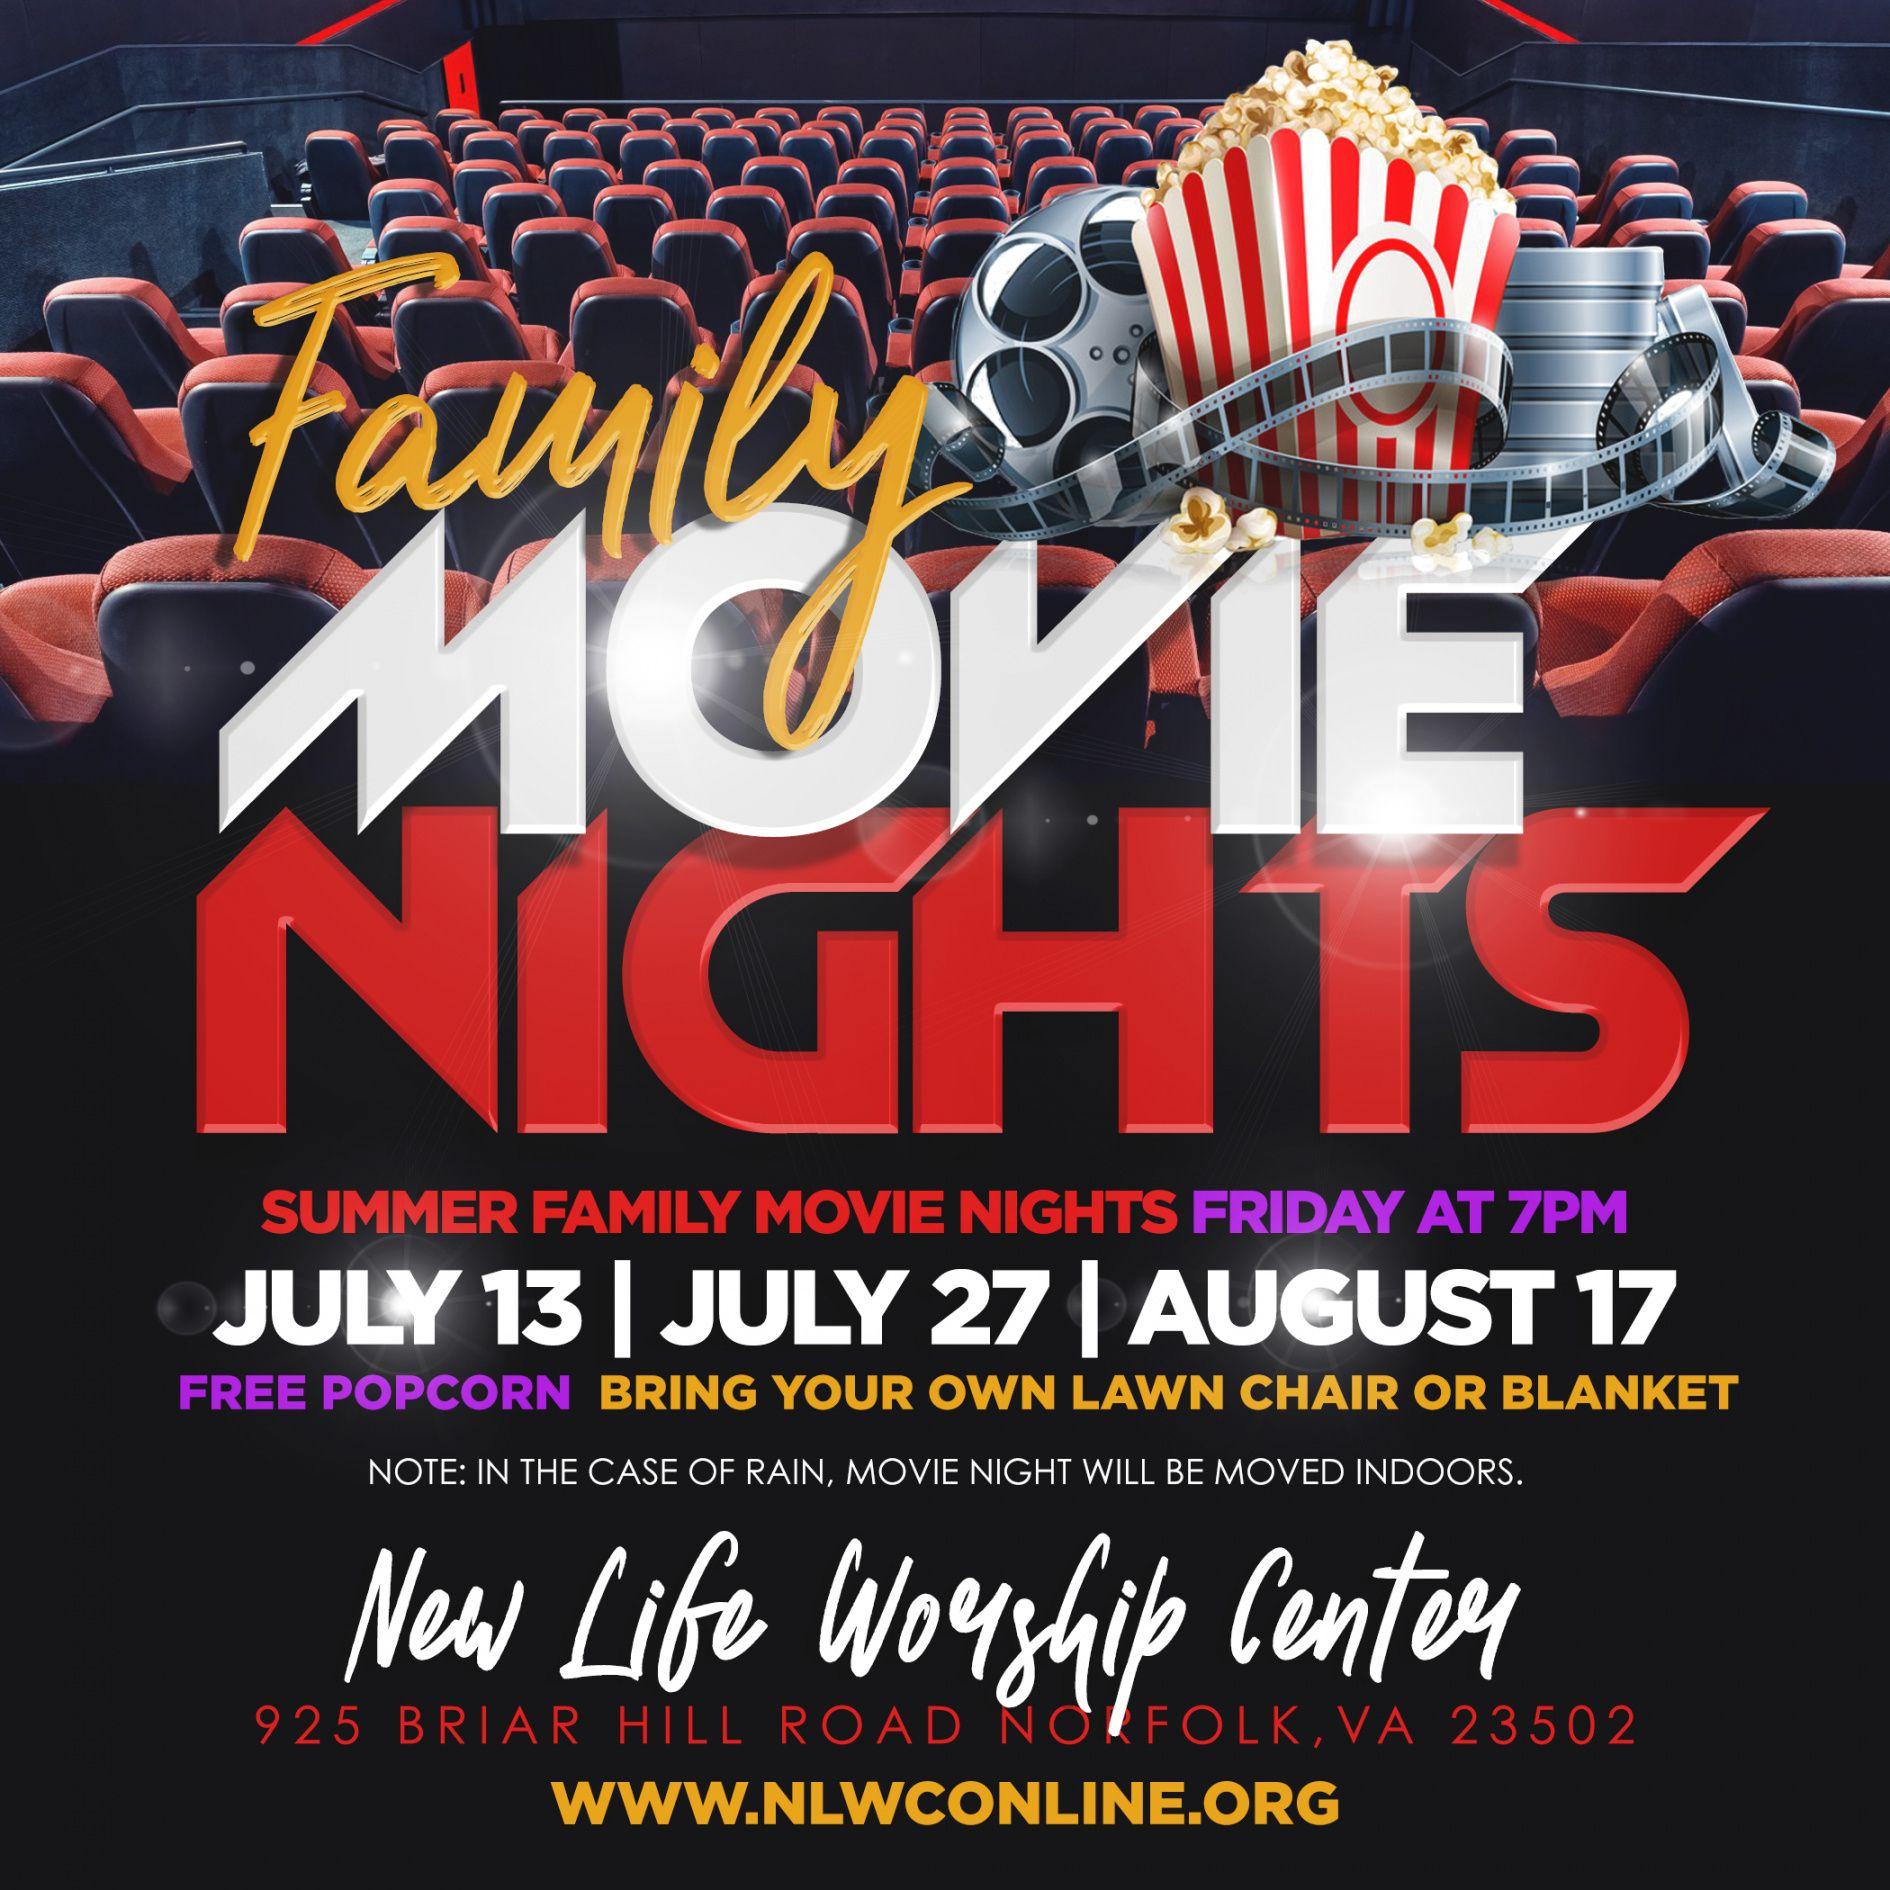 free design my church  church movie night flyer church movie night flyer template doc